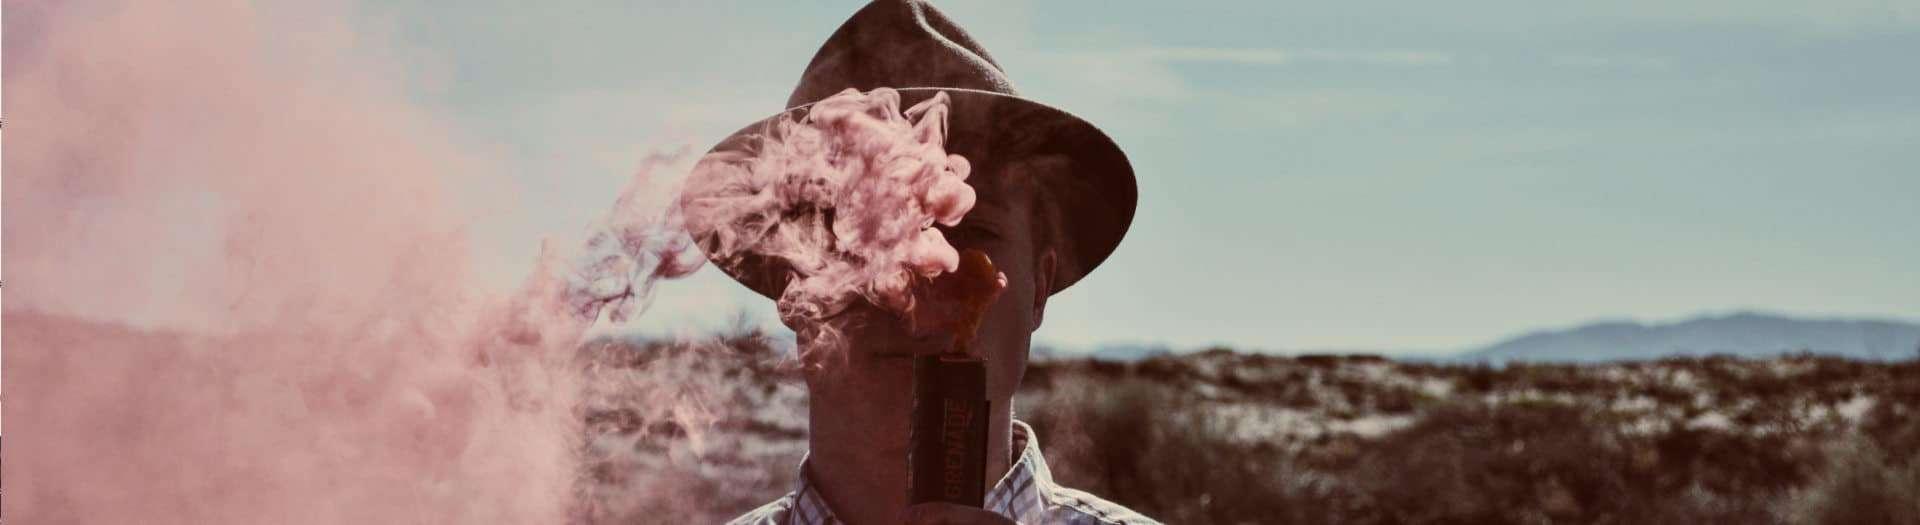 Pink smoke birthday men 1920 x 525